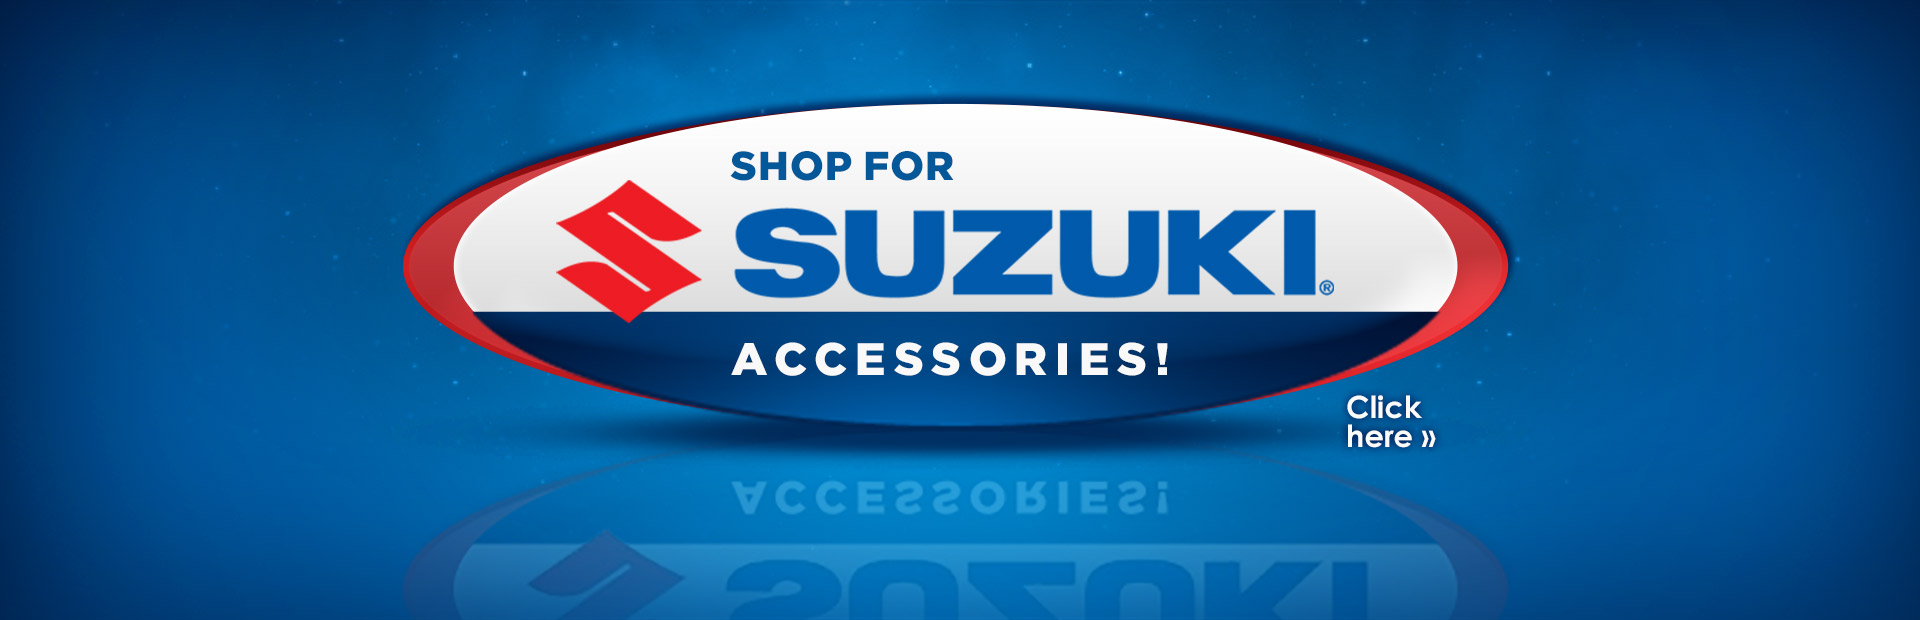 Click here to shop for Suzuki accessories!